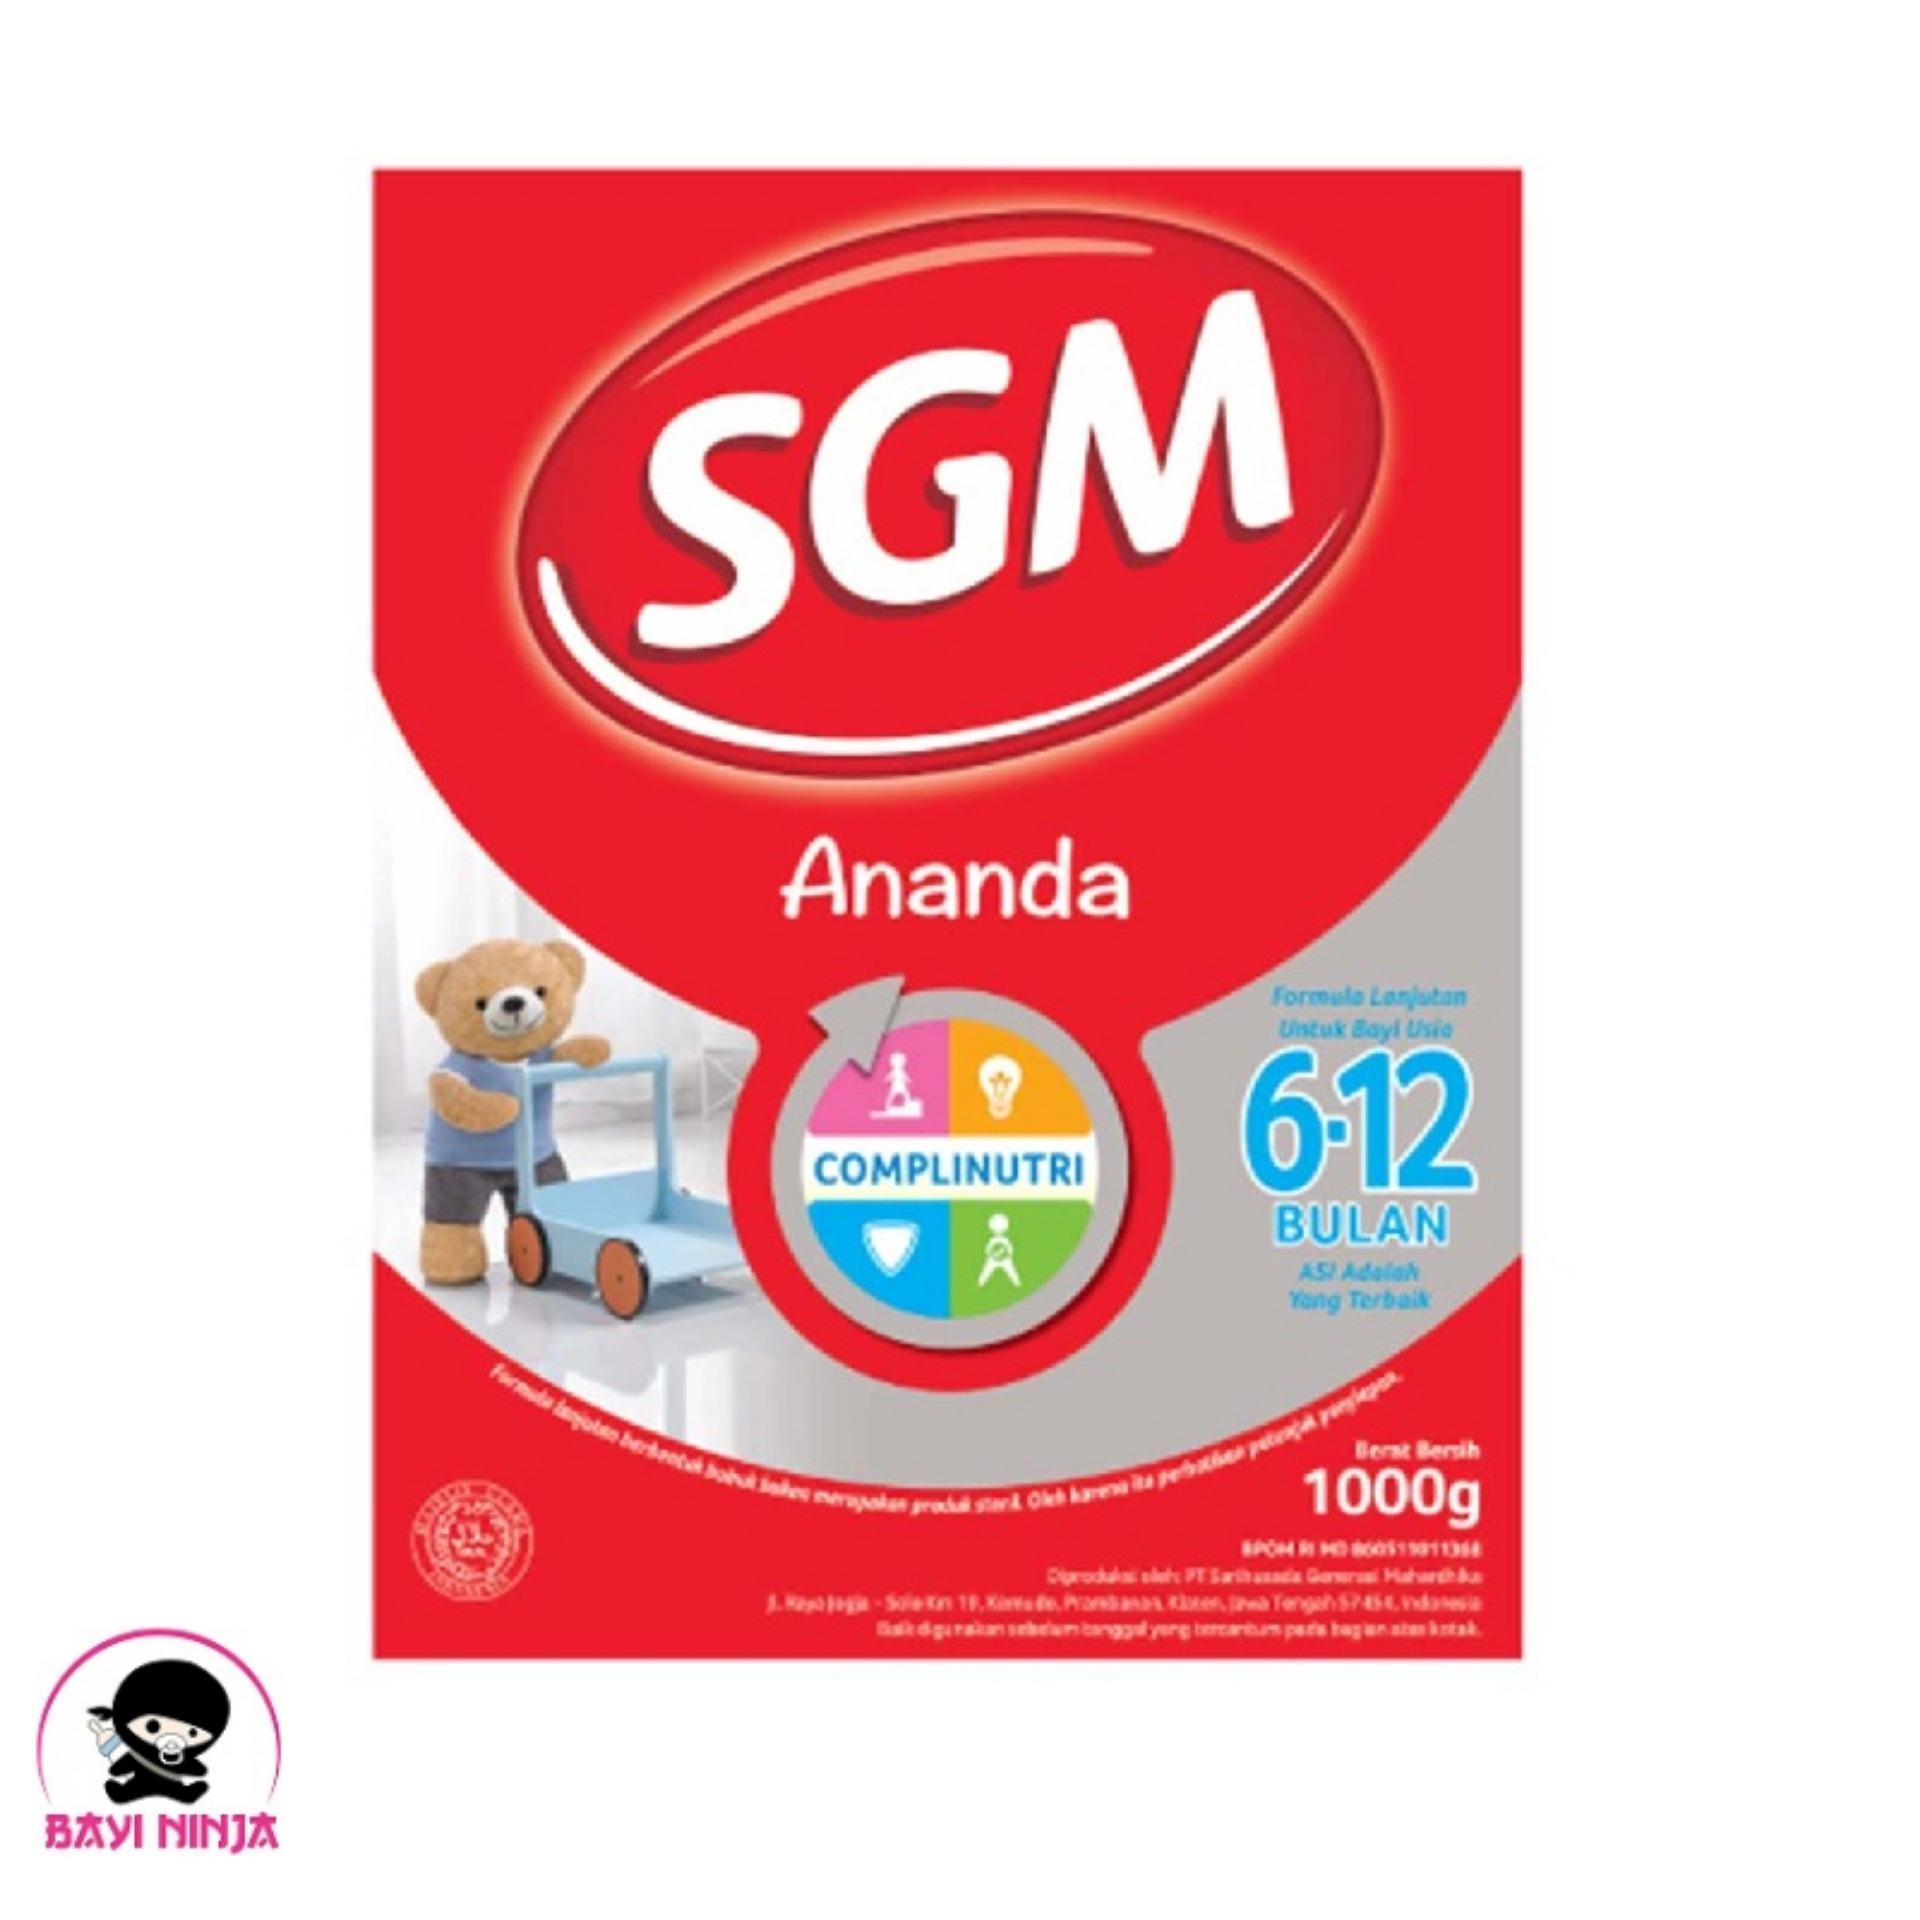 Sgm Ananda 2 Presinutri 6 - 12 Box 1000g / 1000 G By Bayininja.